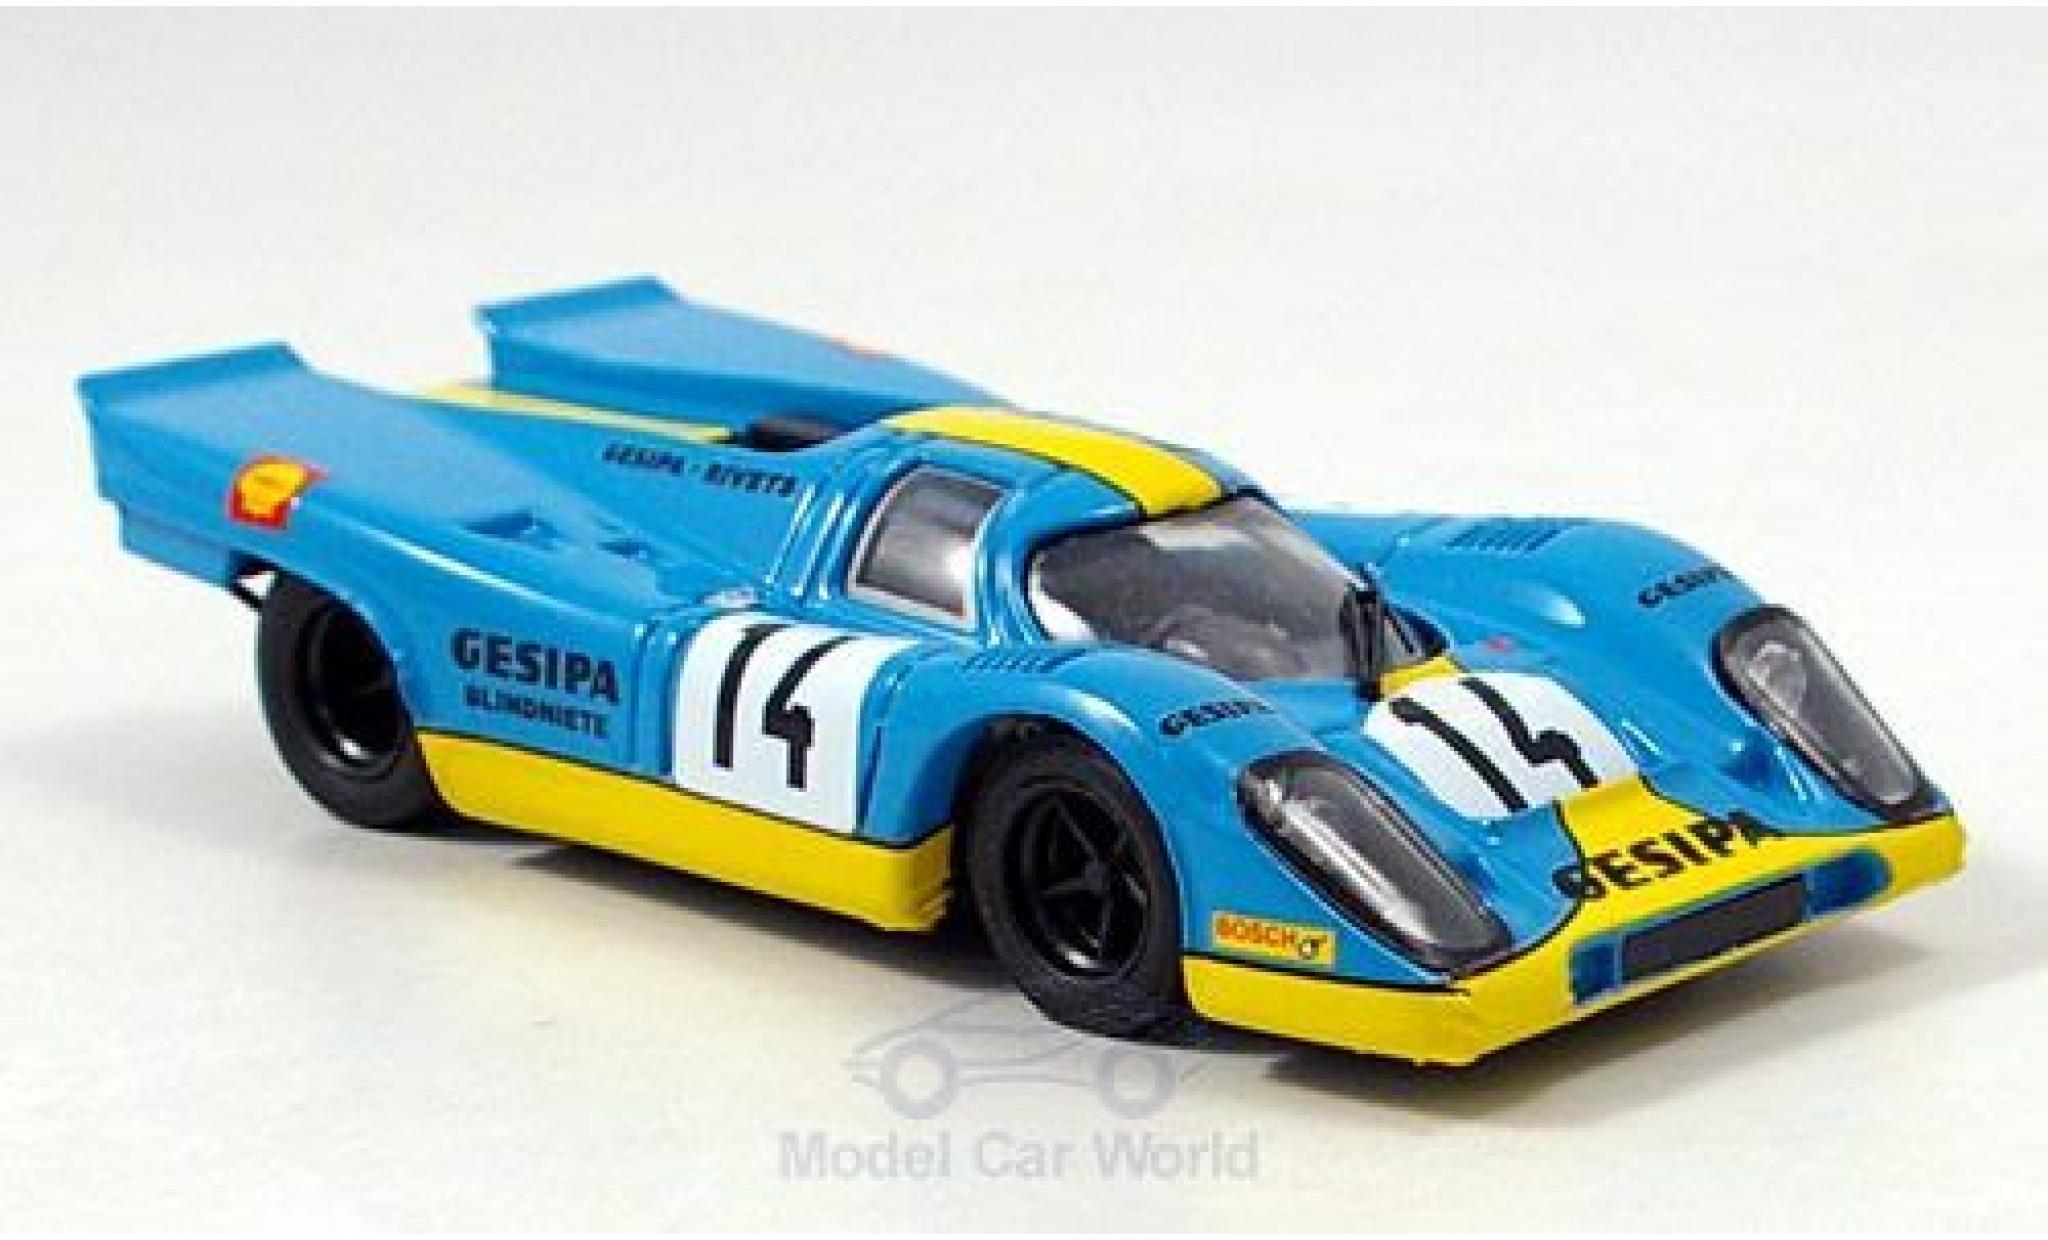 Porsche 917 1970 1/43 Brumm K No.14 Gesipa Racing Team 1000km Monza J.Neuhaus/R.Kelleners